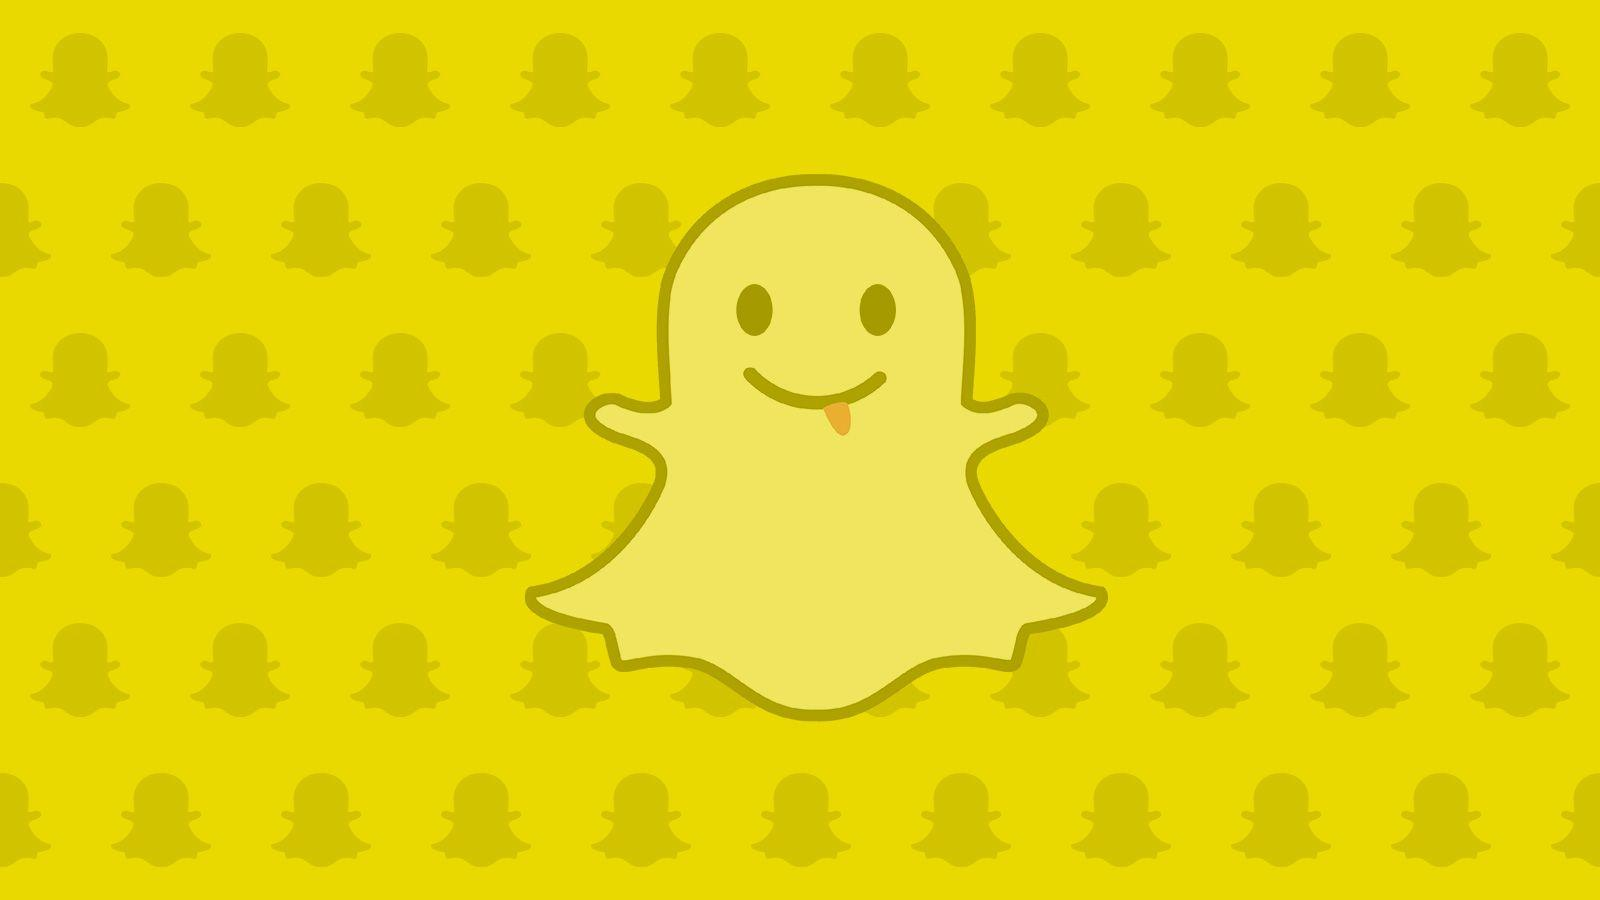 Snapchat Wallpapers - Wallpaper Cave